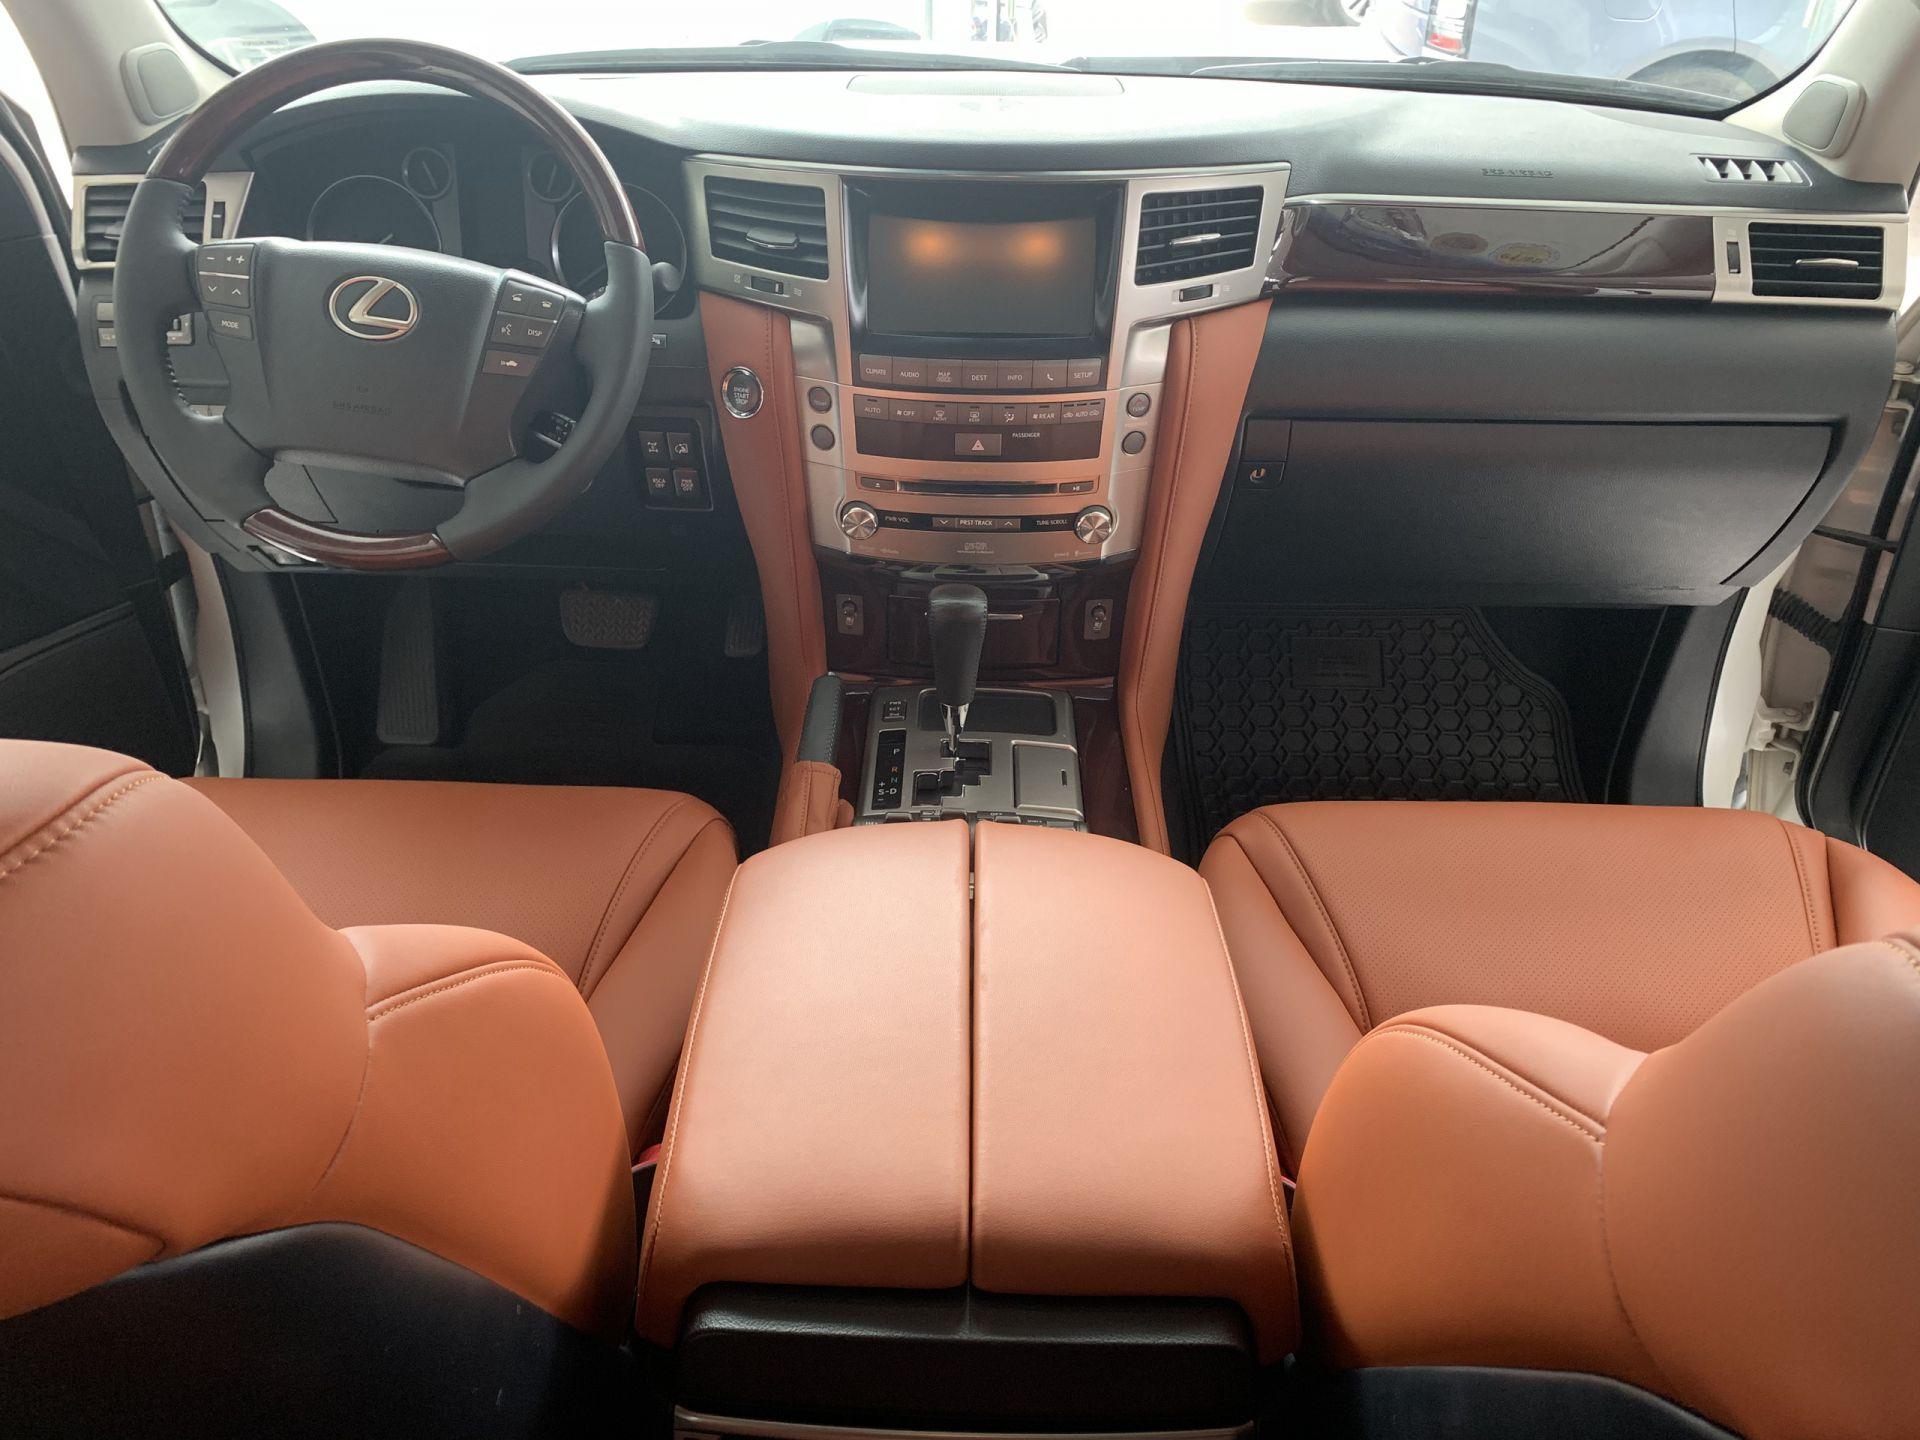 Lexus LX 570 2012 (SOLD)